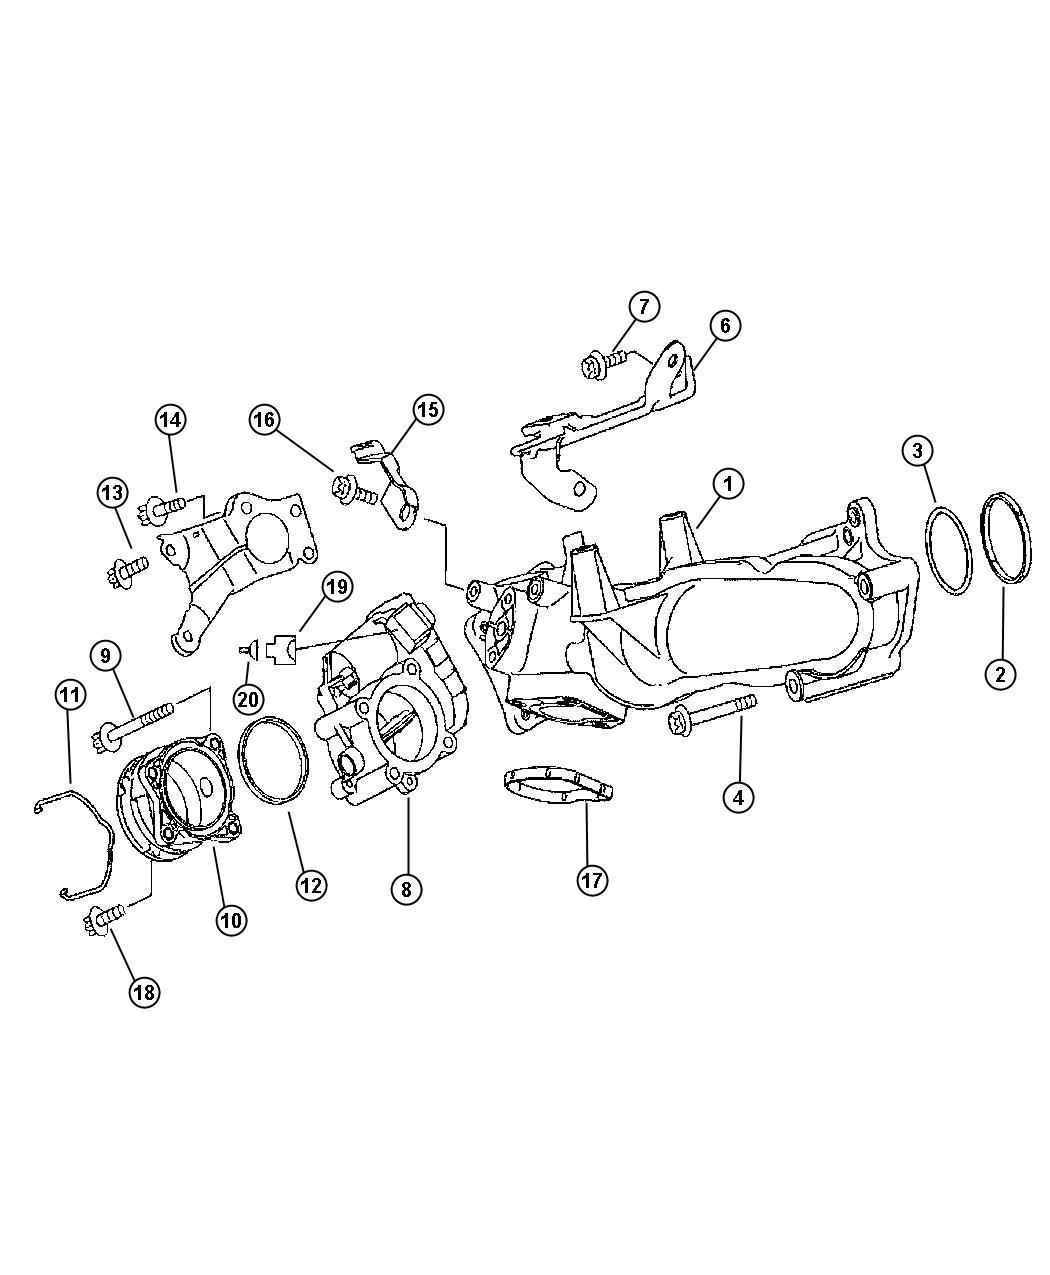 92 Acura Legend Engine on 1995 Ford Probe Radio Wiring Diagram